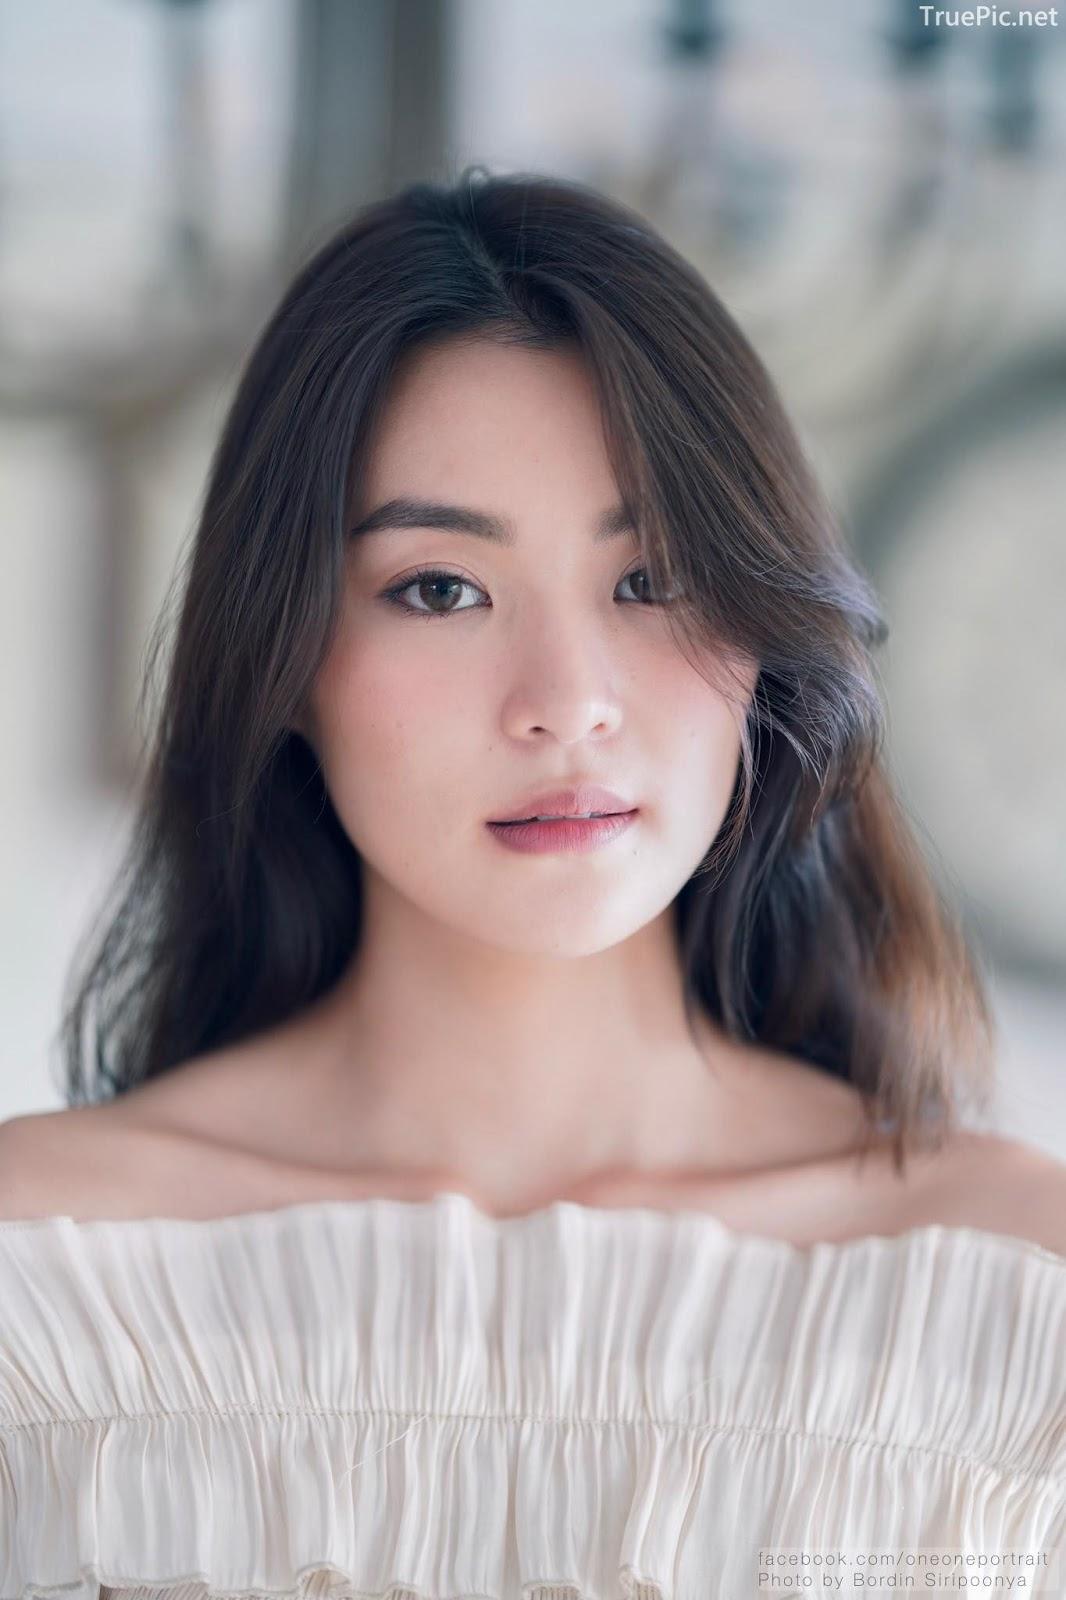 Beauty Thailand Kapook Phatchara vs Photo album Love you 3000 - Picture 5